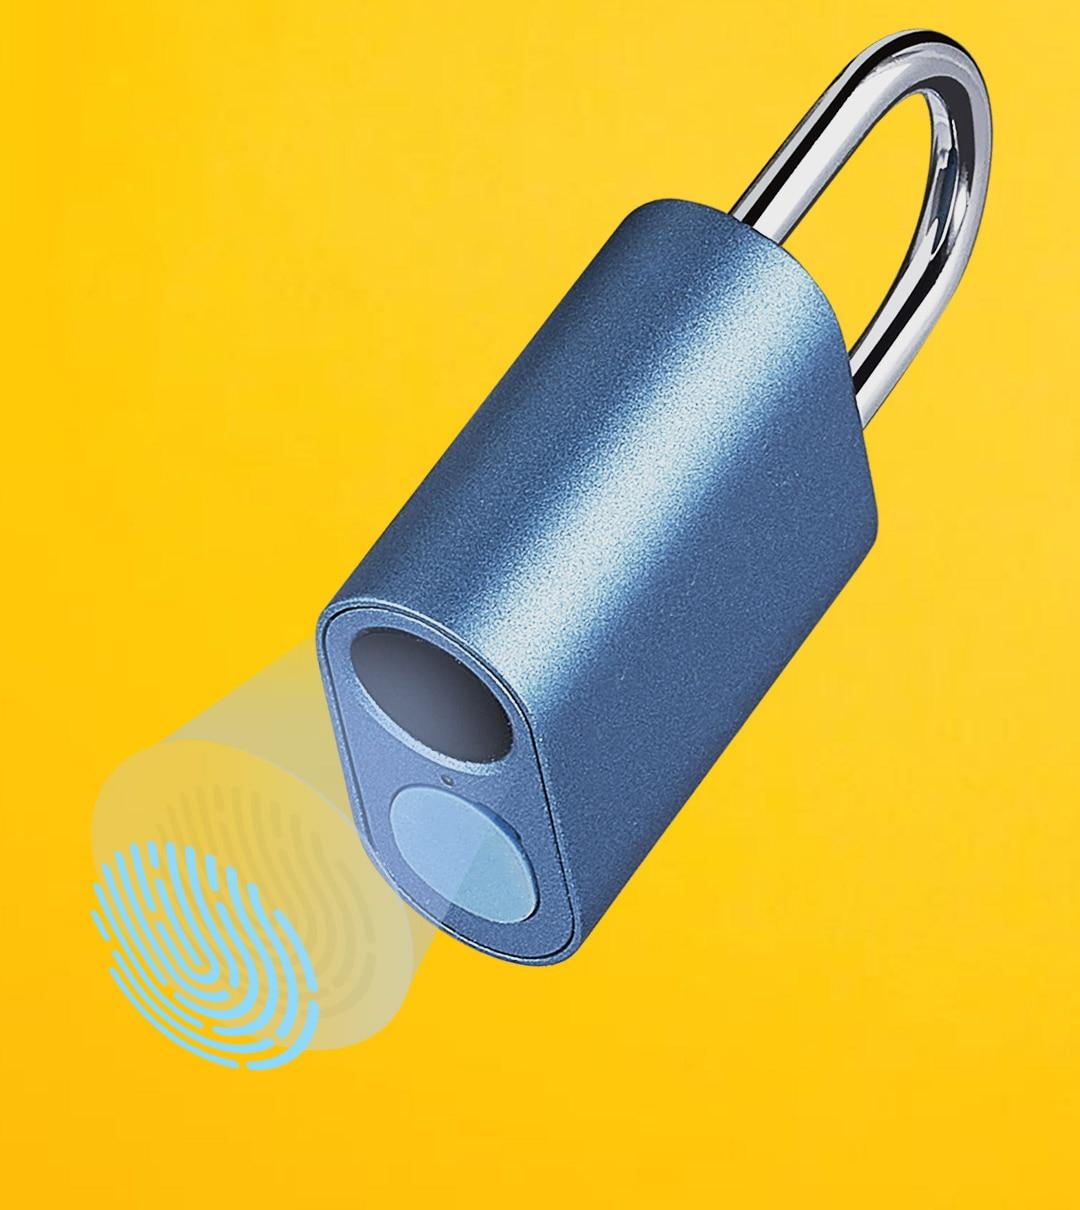 NEW XIAOMI Noc Loc Smart Fingerprint Padlock USB Rechargeable IPX7 Waterproof Mini Portable Intelligent Lock Finger Print Unlock